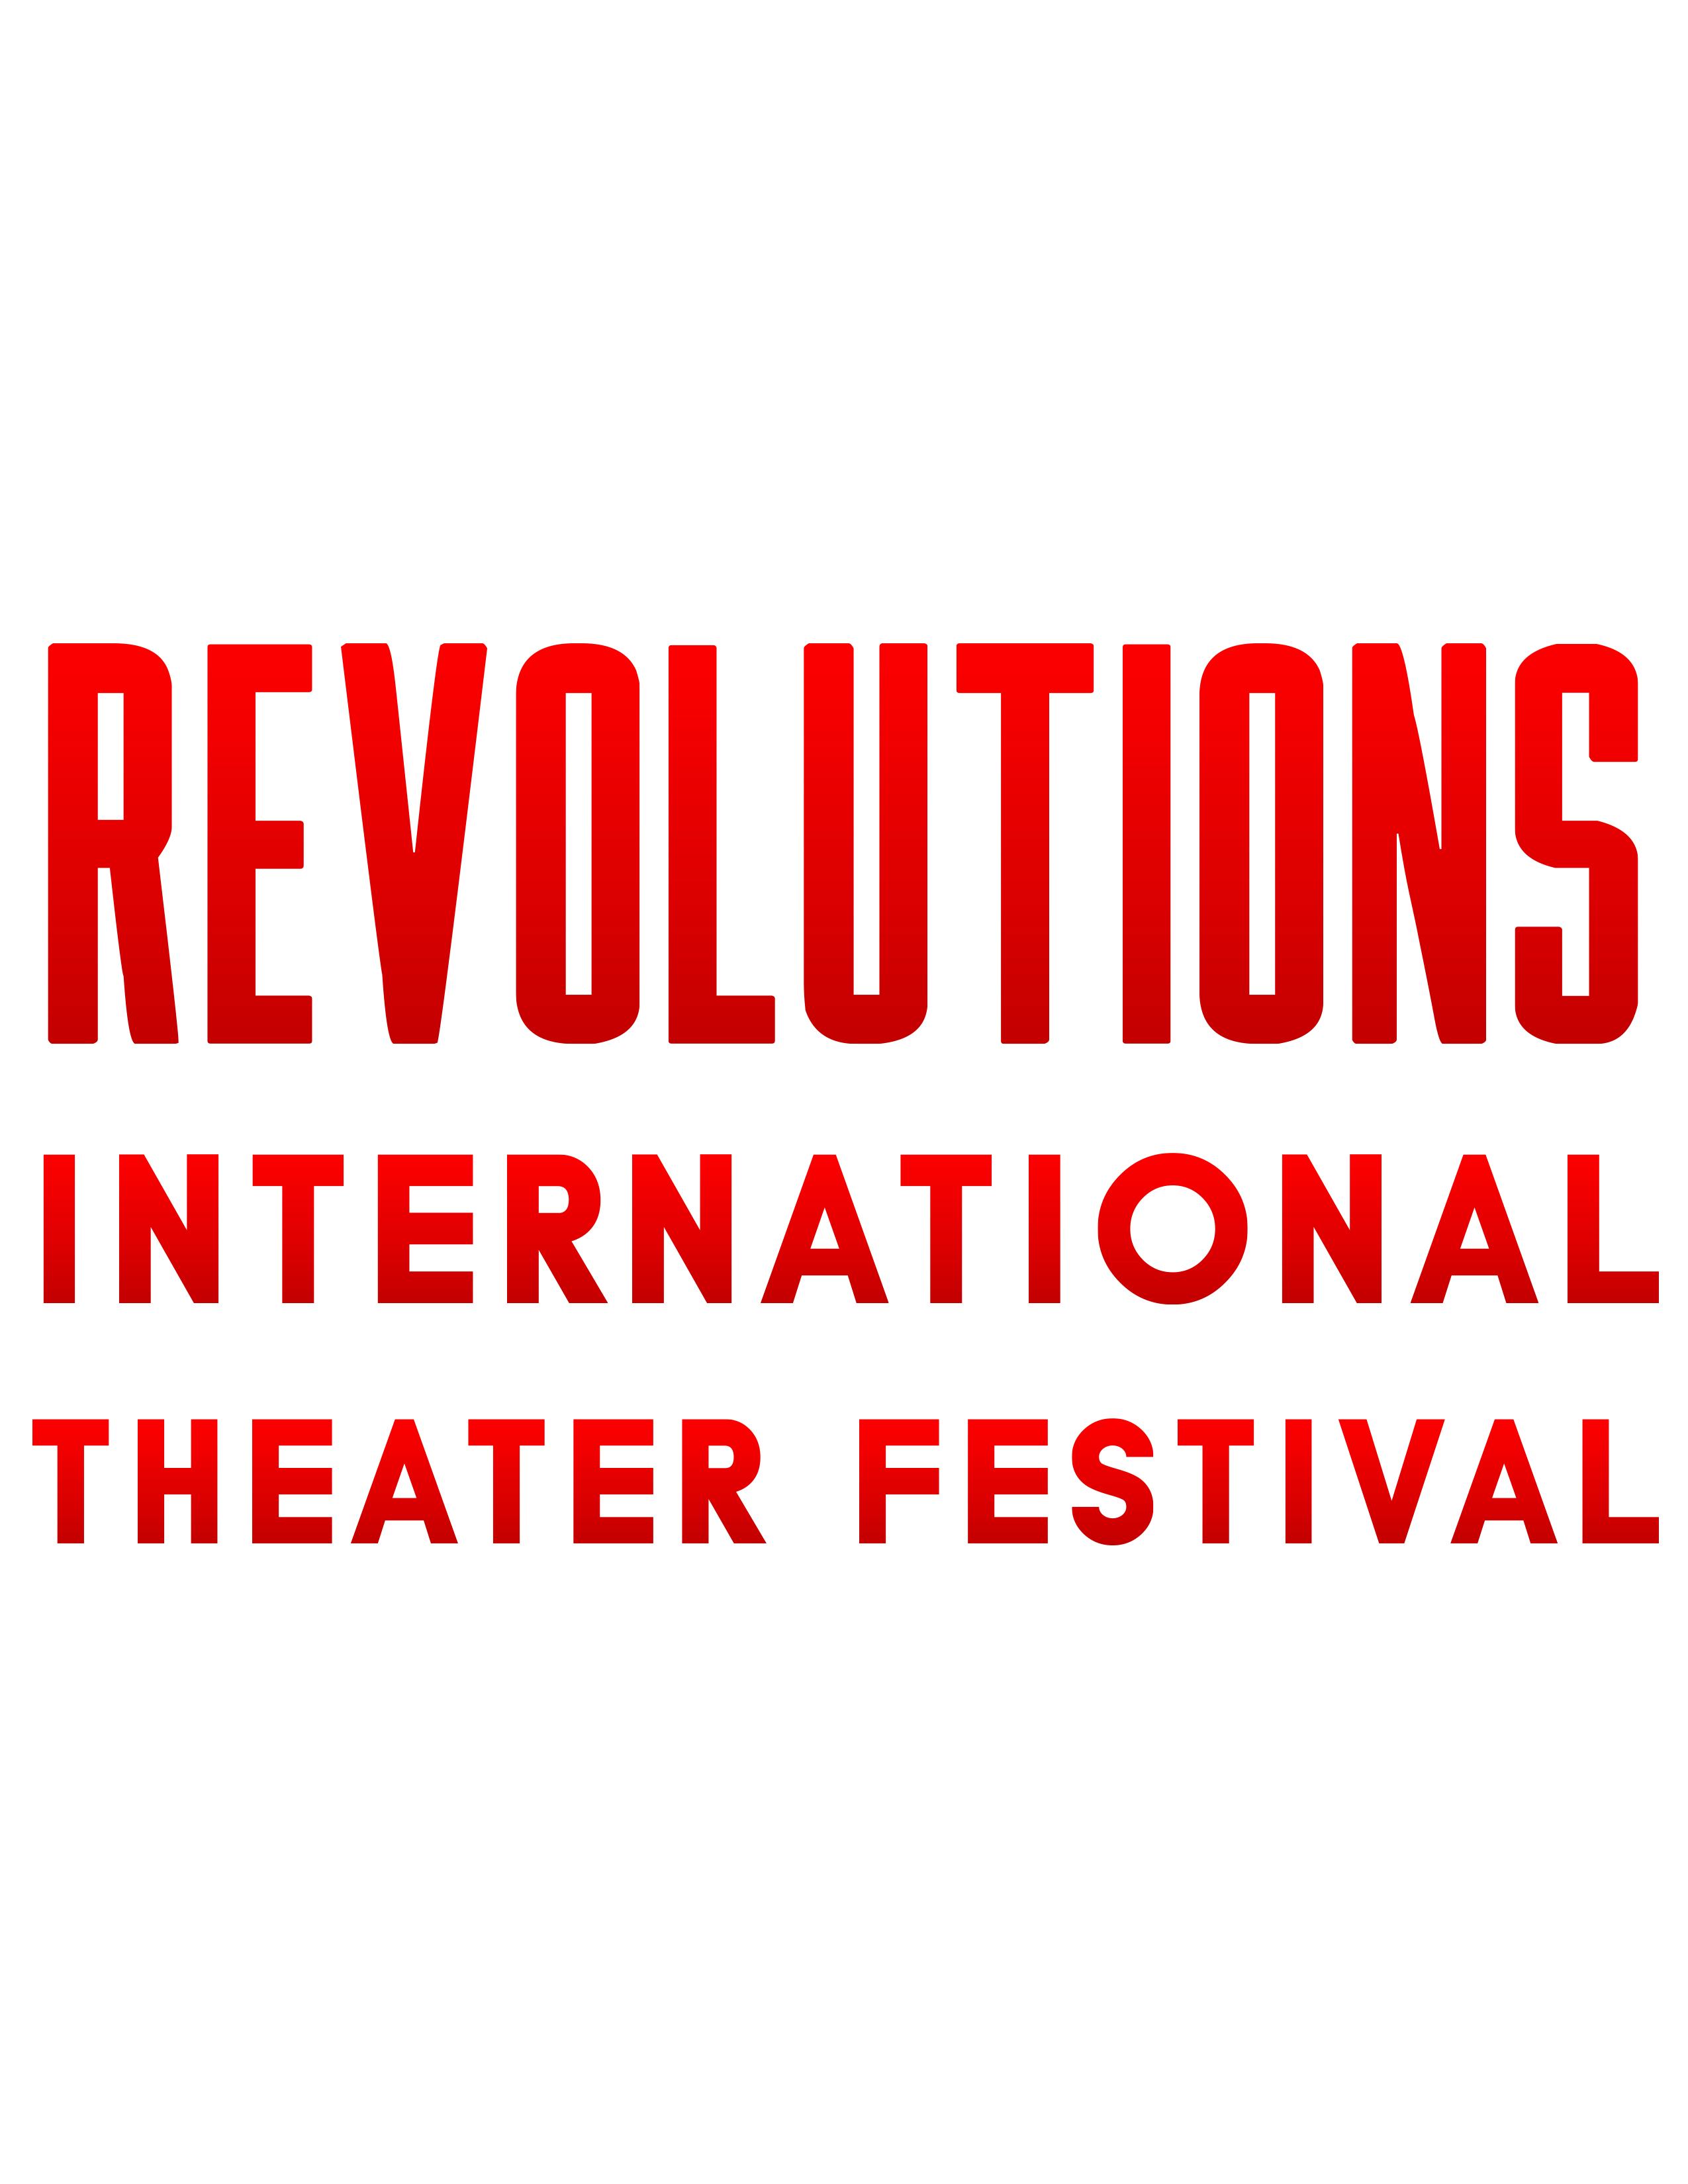 Creative Bravos - Revolutions Logo